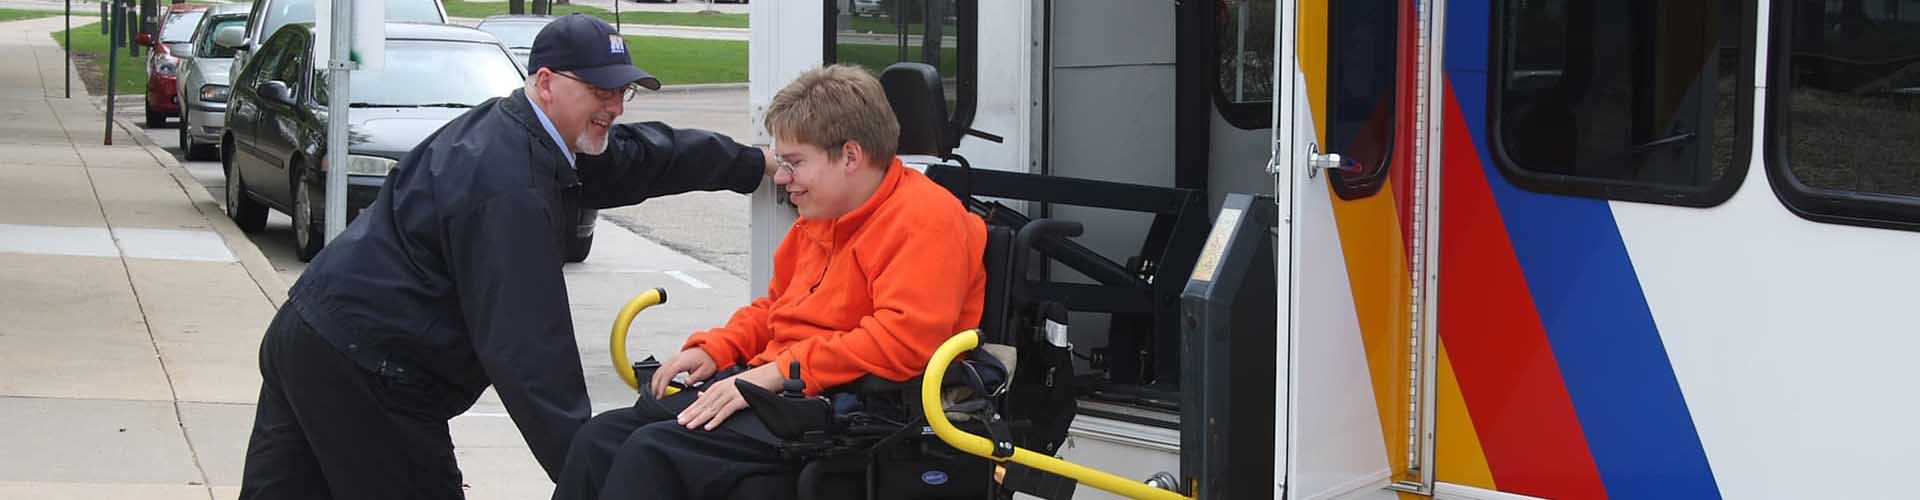 Driver assists passenger in wheelchair de-board transit vehicle in Wisconsin